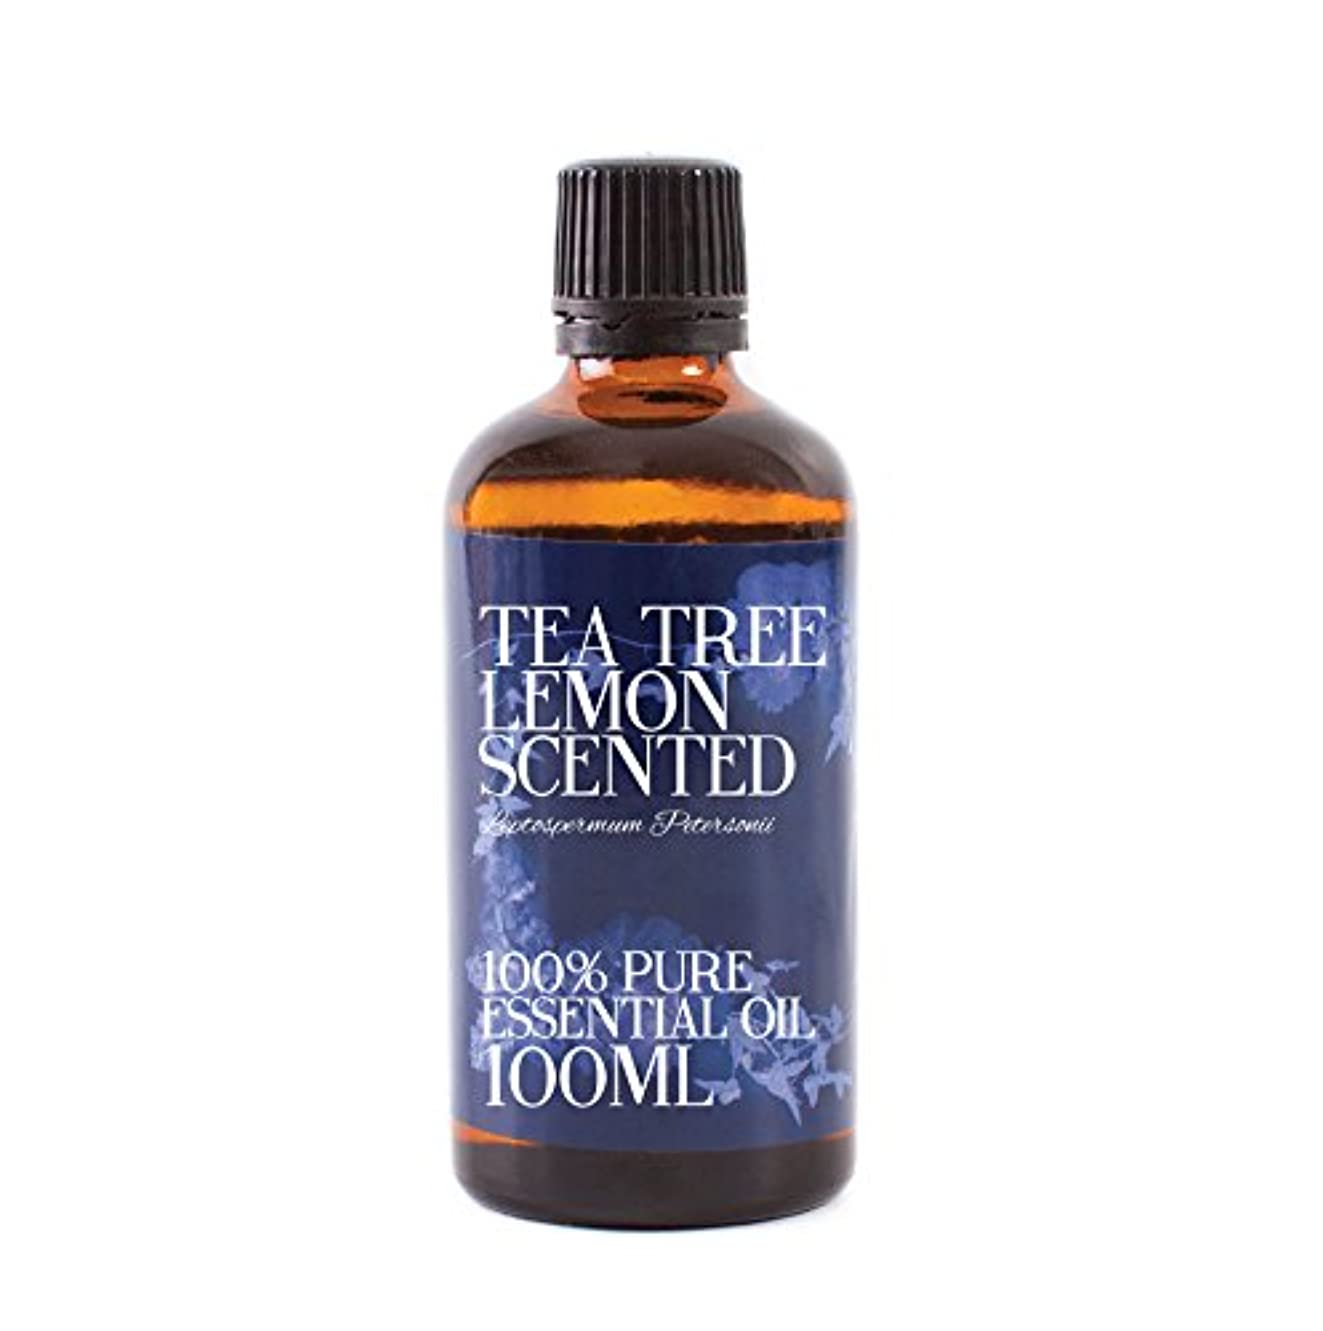 Mystic Moments | Tea Tree Lemon Scented Essential Oil - 100ml - 100% Pure